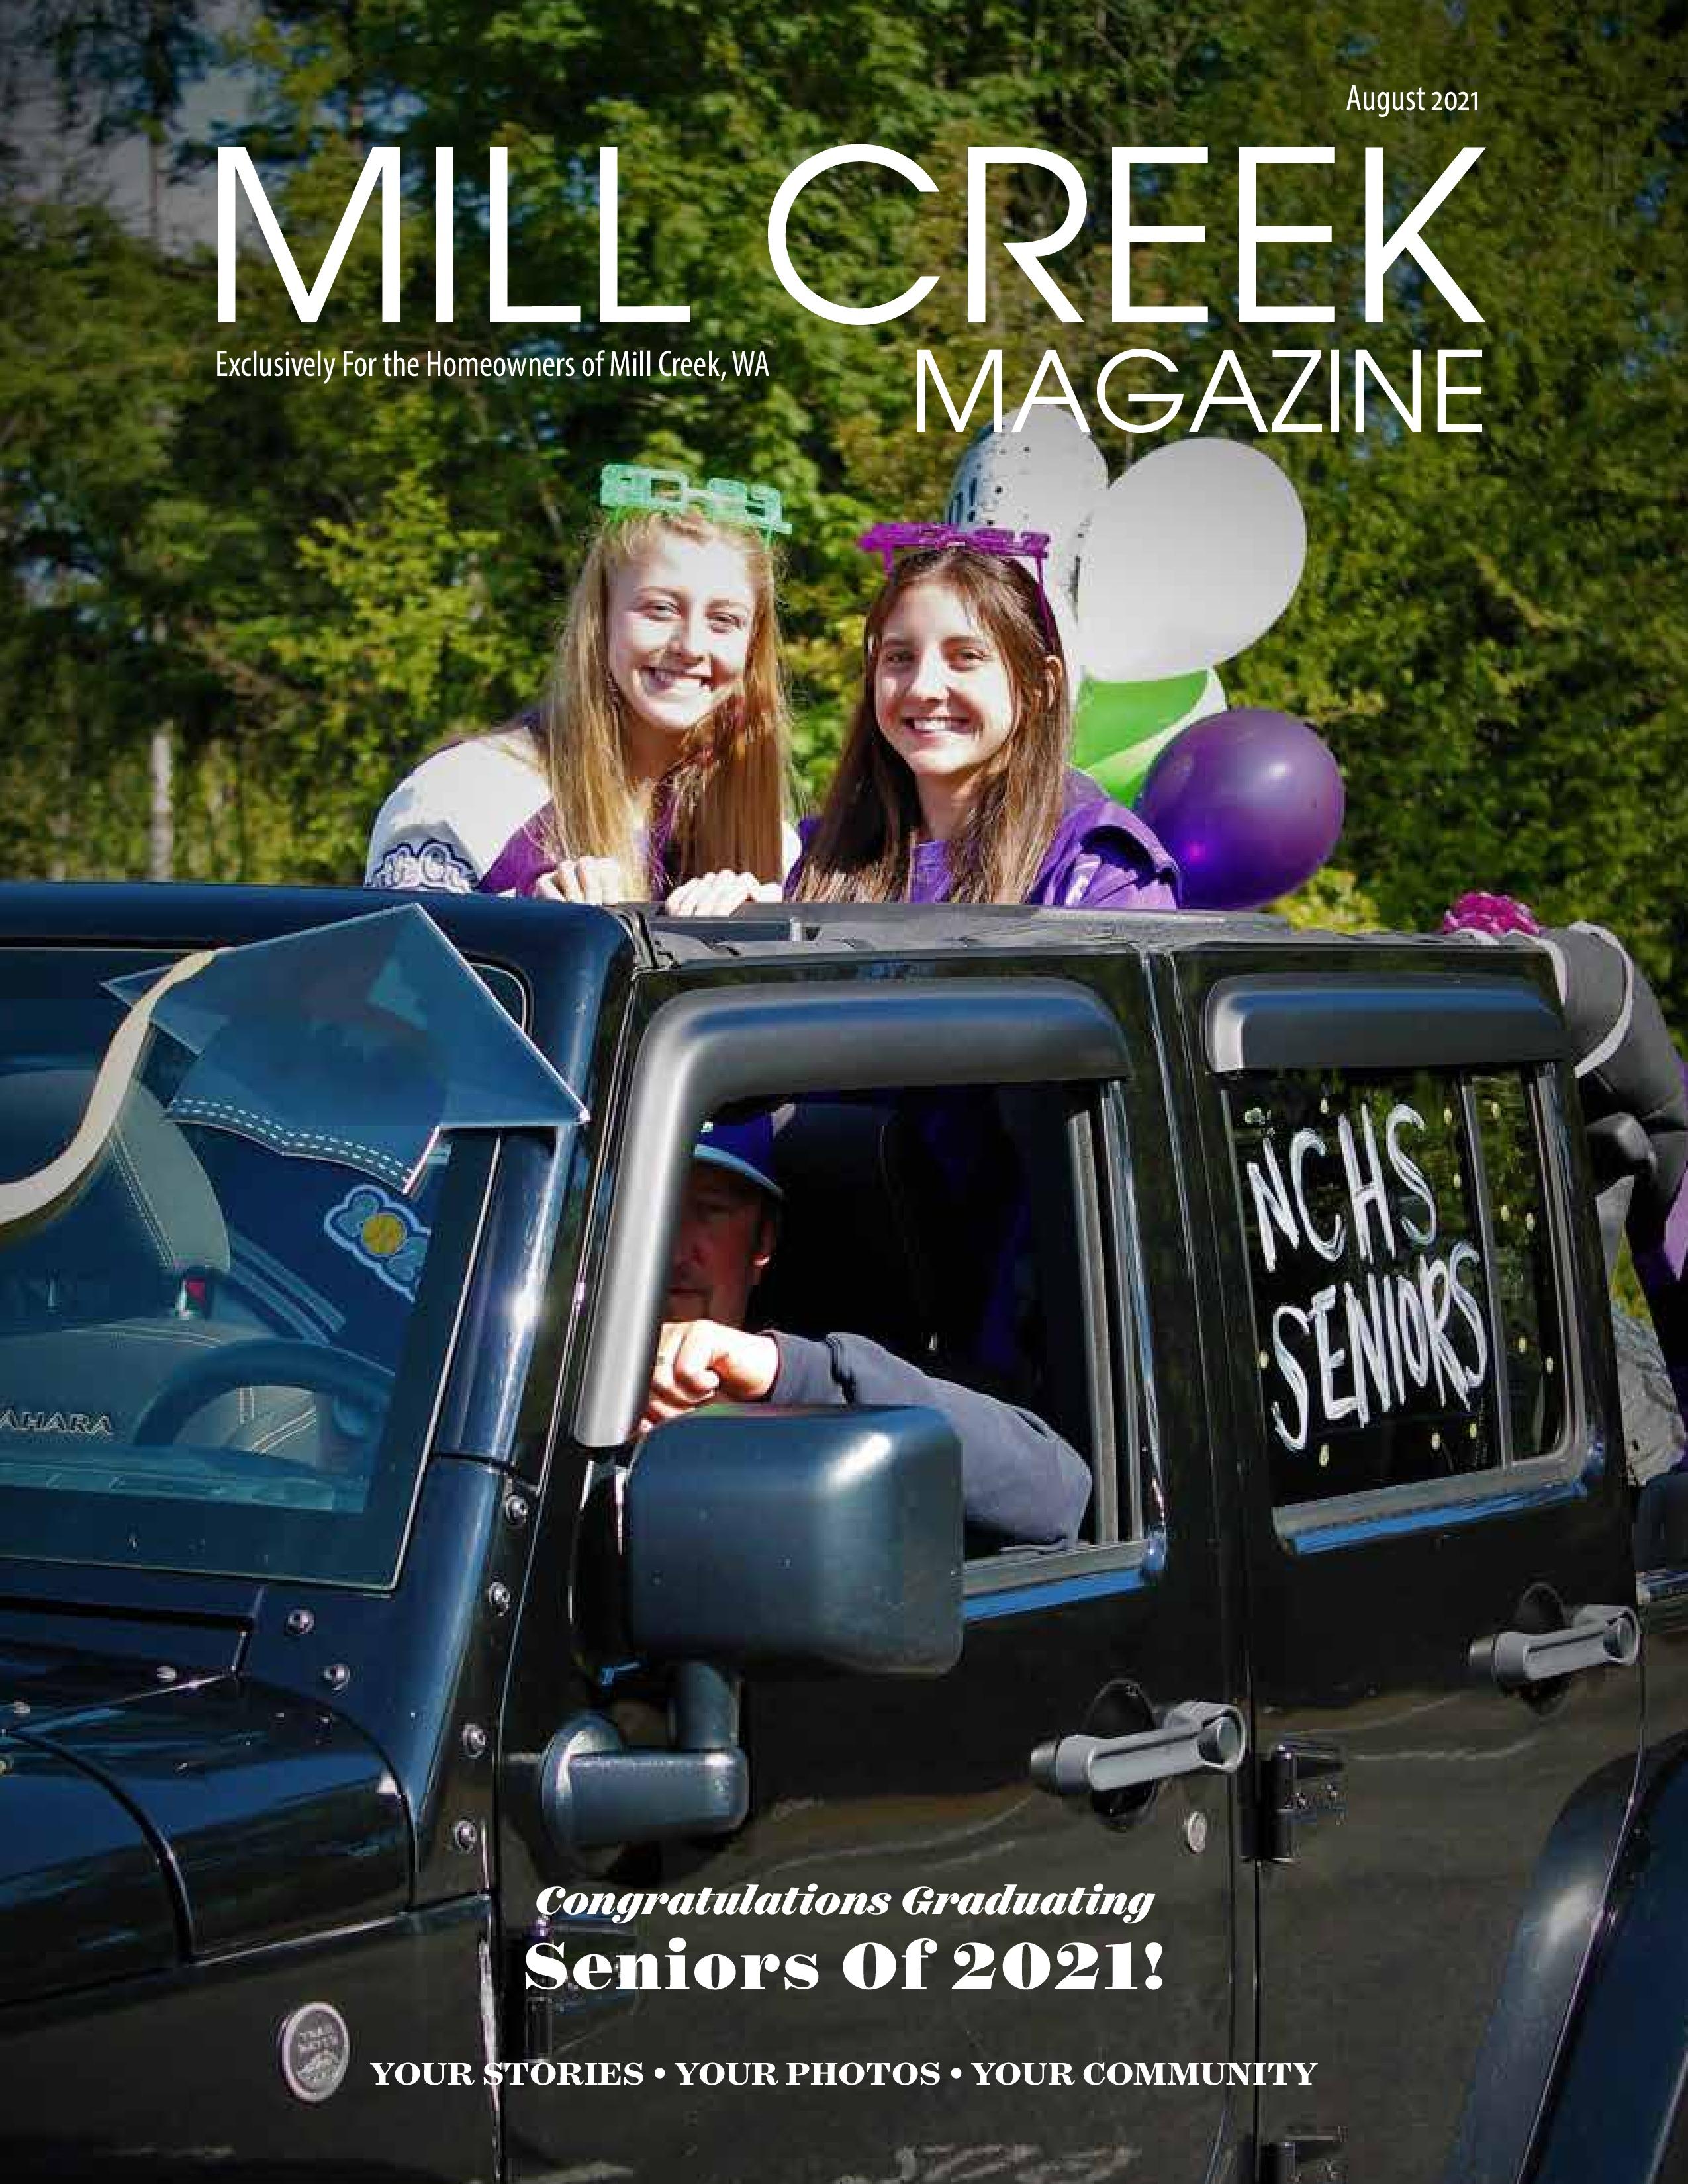 Mill Creek Magazine 2021-08-01